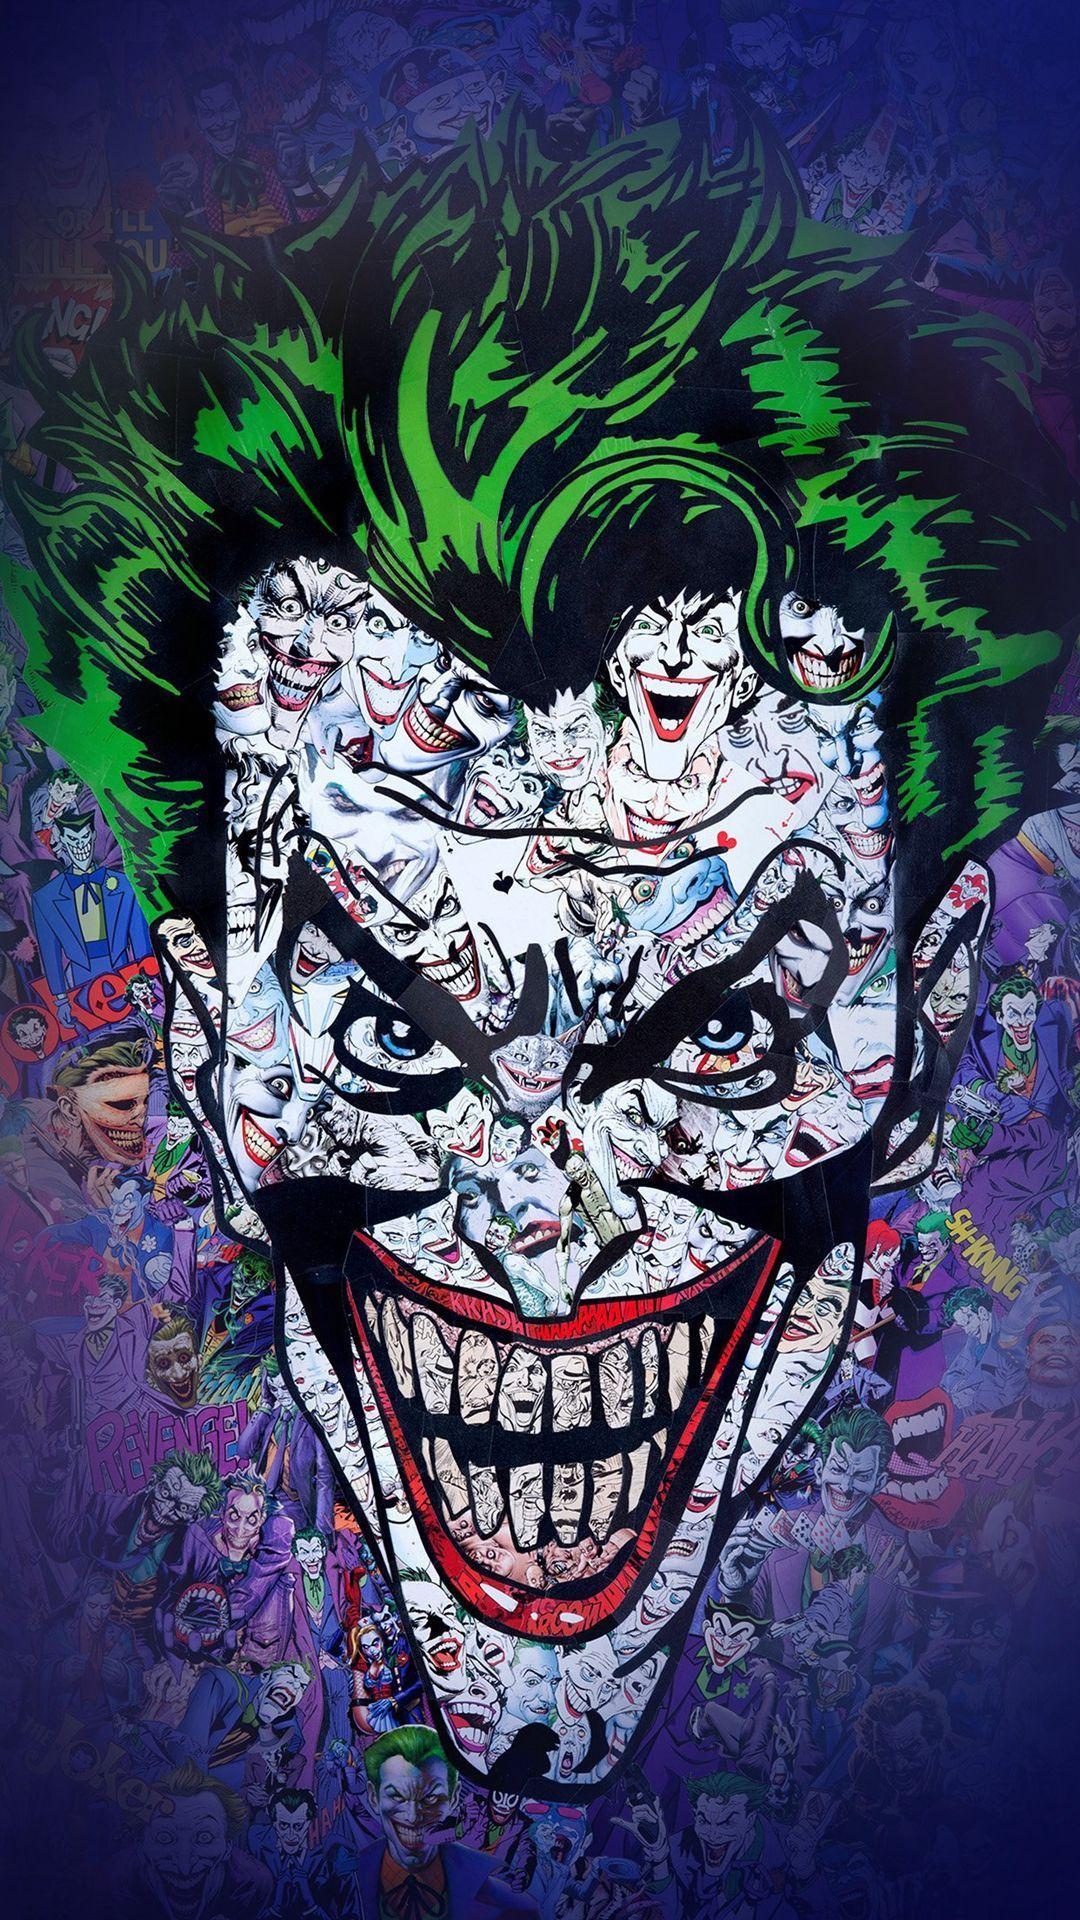 Joker Images Cartoon : joker, images, cartoon, Joker, Cartoon, Wallpaper, Iphone